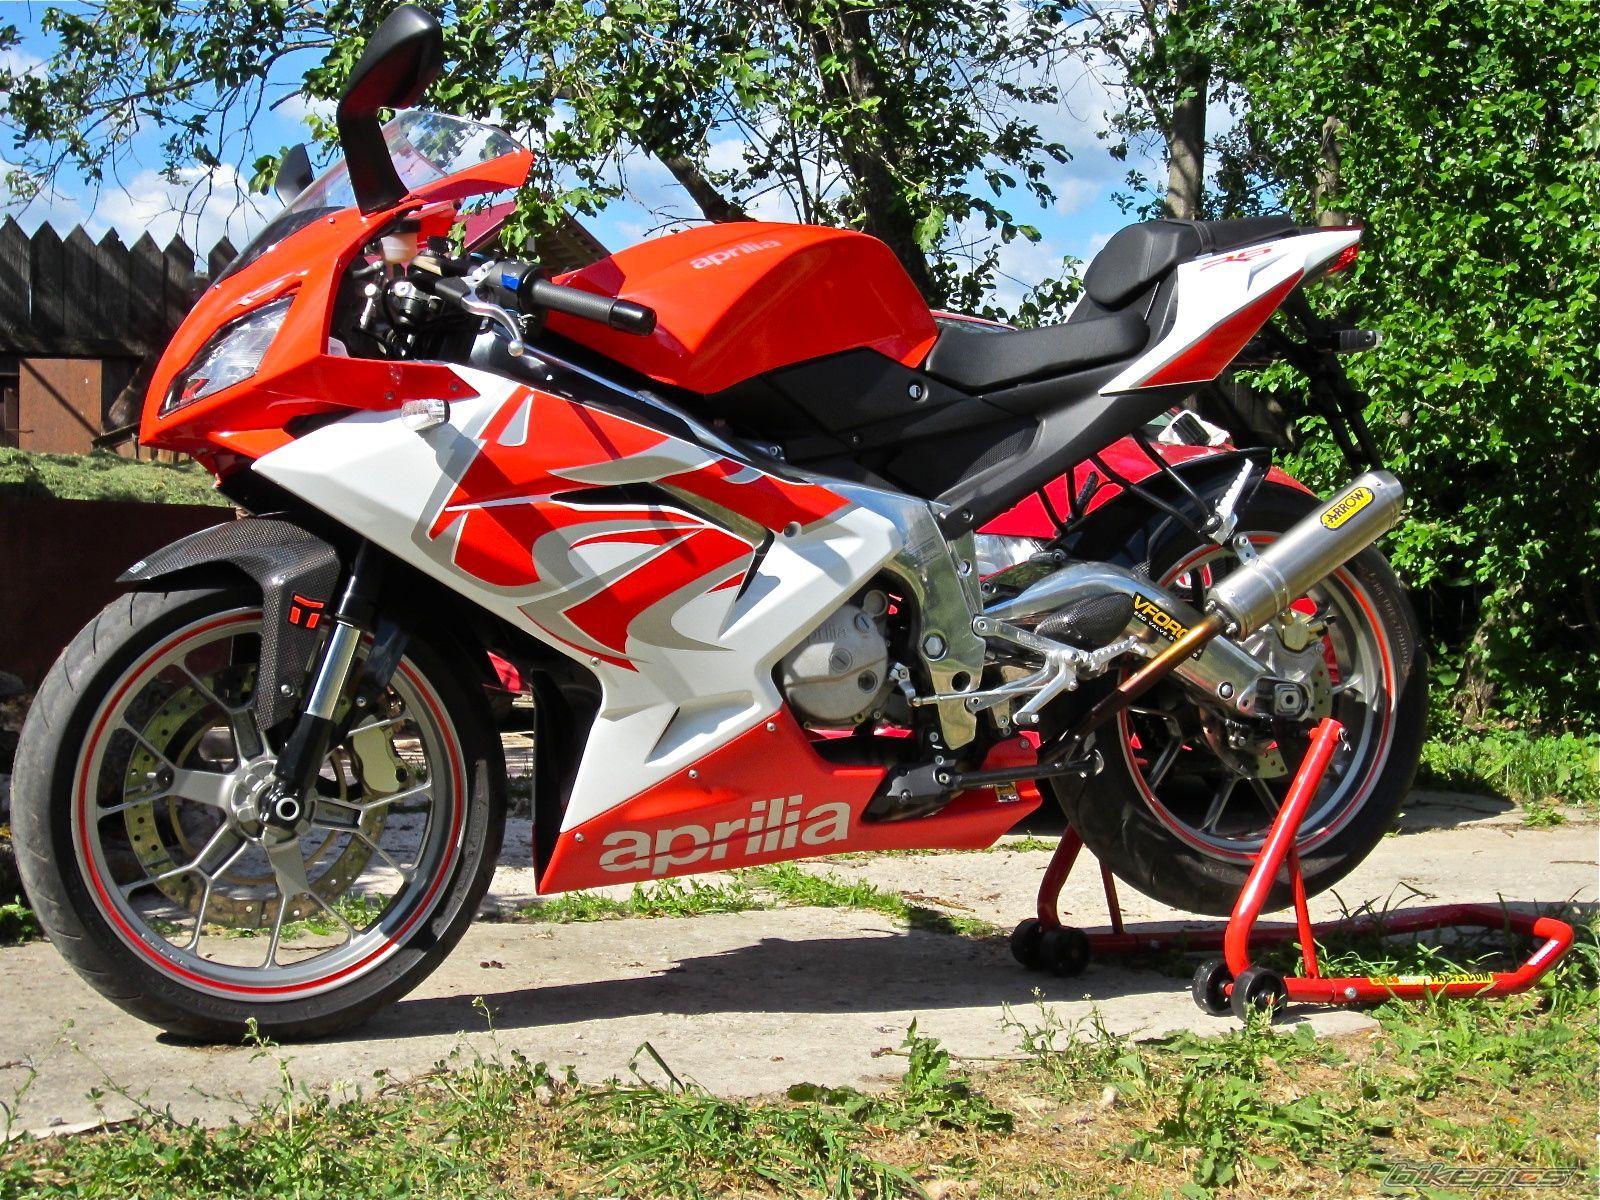 Aprilia Rs 125 Wiring Diagram 2006 Laser Diode Driver Circuit Http Tyga Performance Alexbodrov Bikepics 2220248